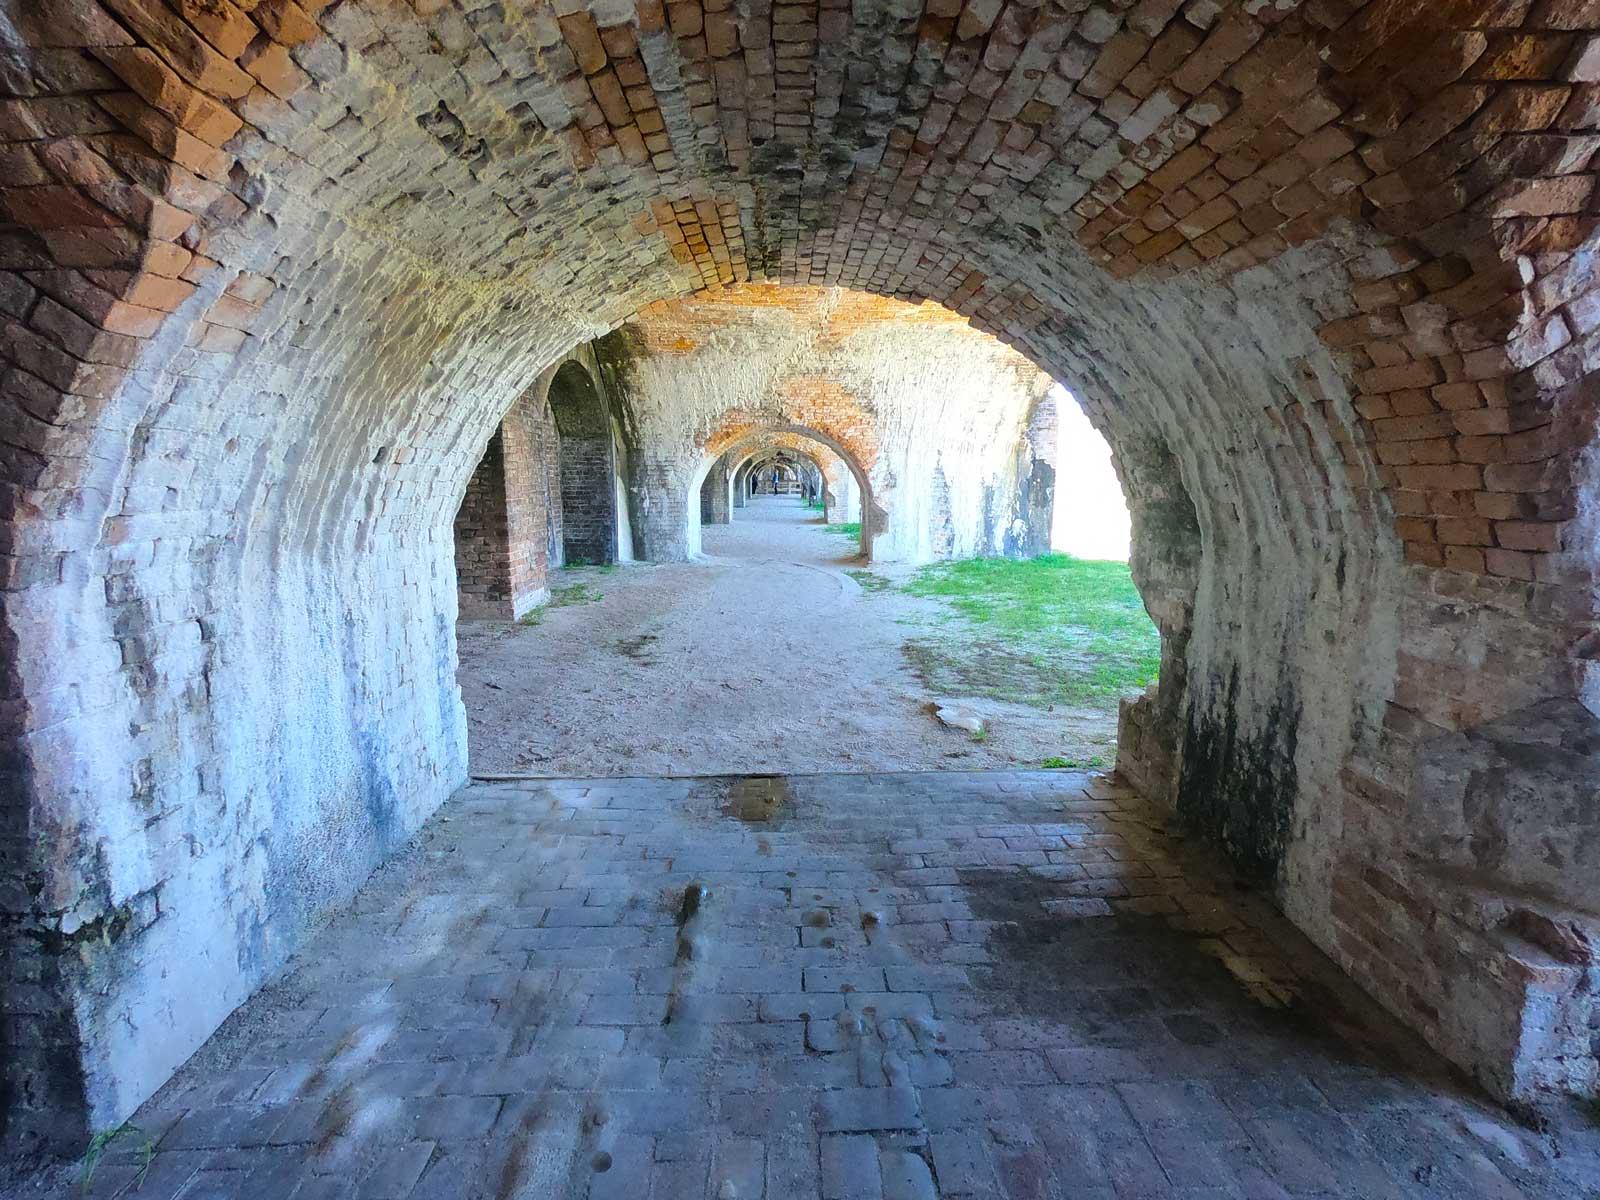 Brick archway construction at Fort Pickens, Pensacola Beach, Florida